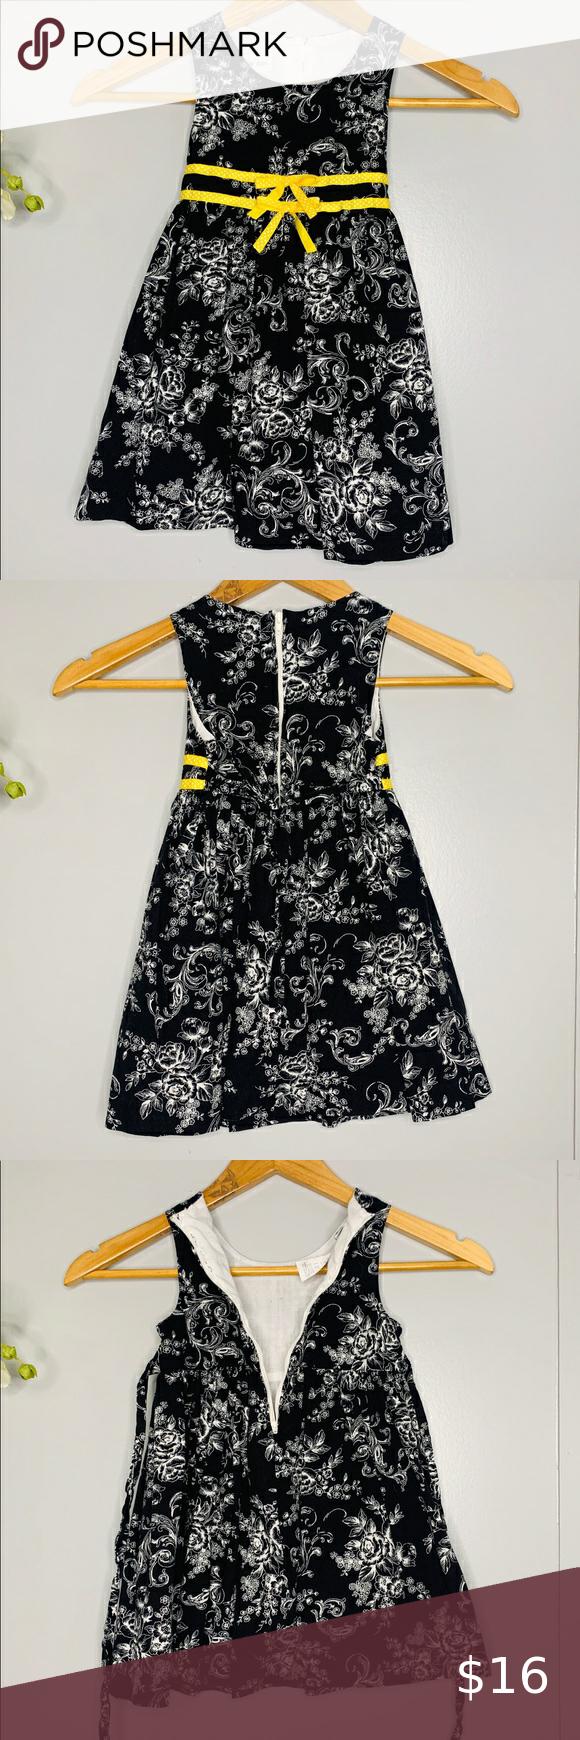 Bonnie Jean Dress 3t In 2020 Bonnie Jean Dress Bonnie Jean 3t Dress [ 1740 x 580 Pixel ]